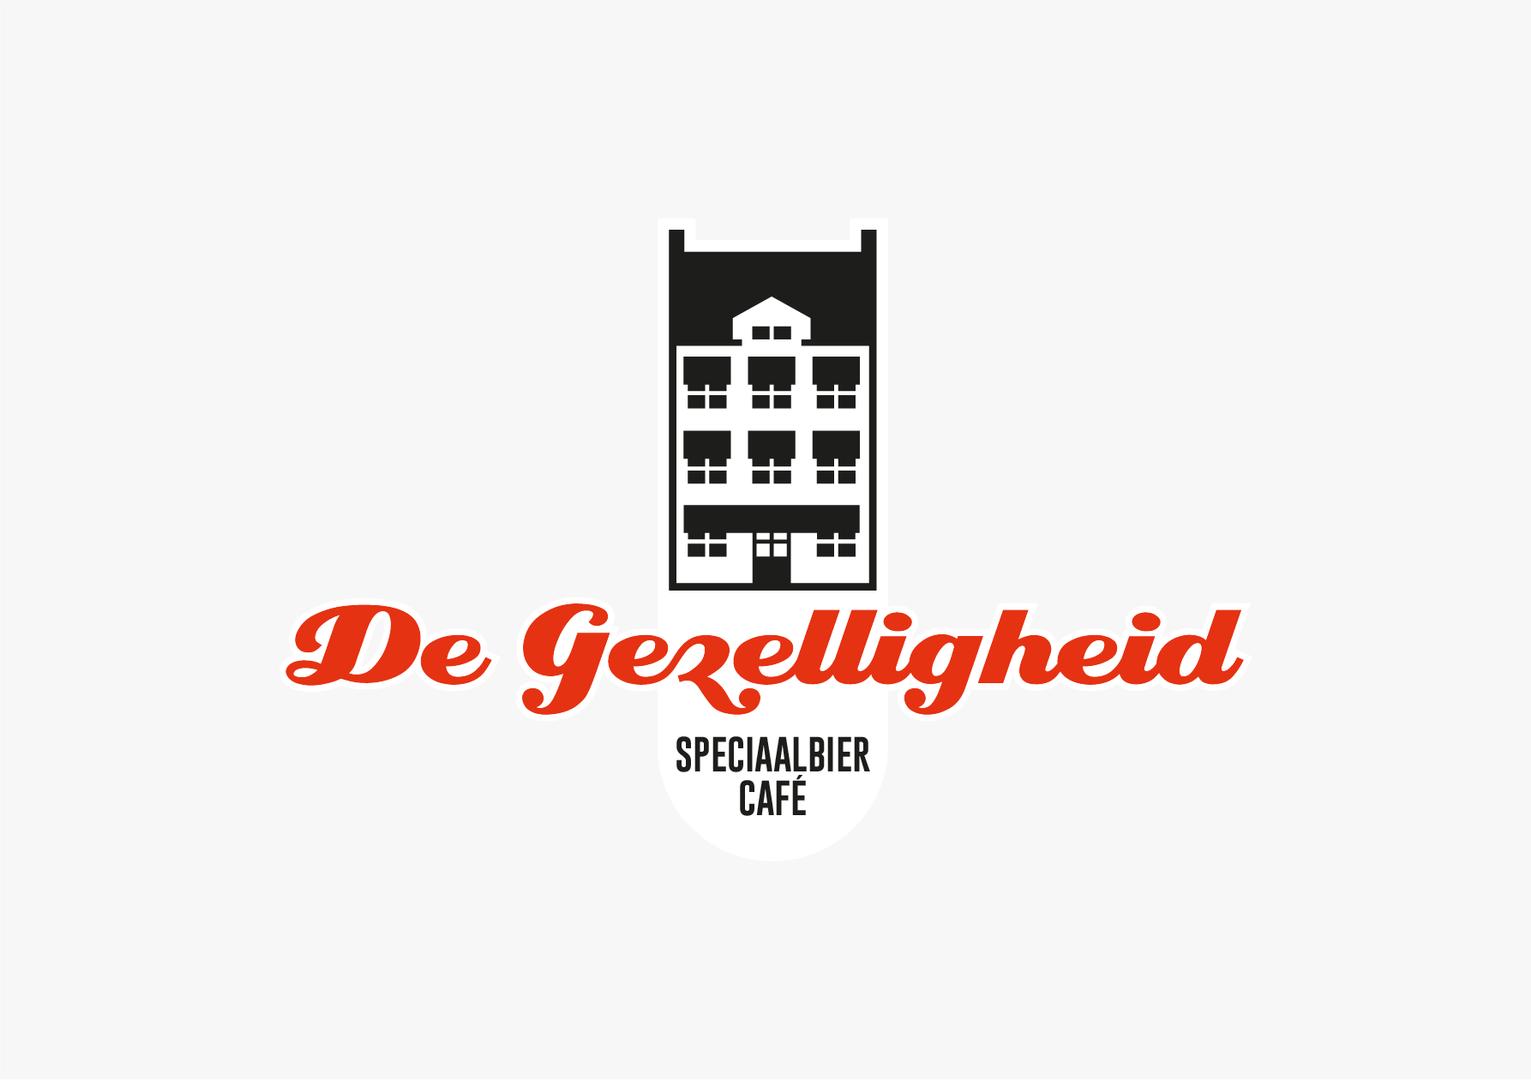 Café De Gezelligheid - gezelligste café van Zwolle